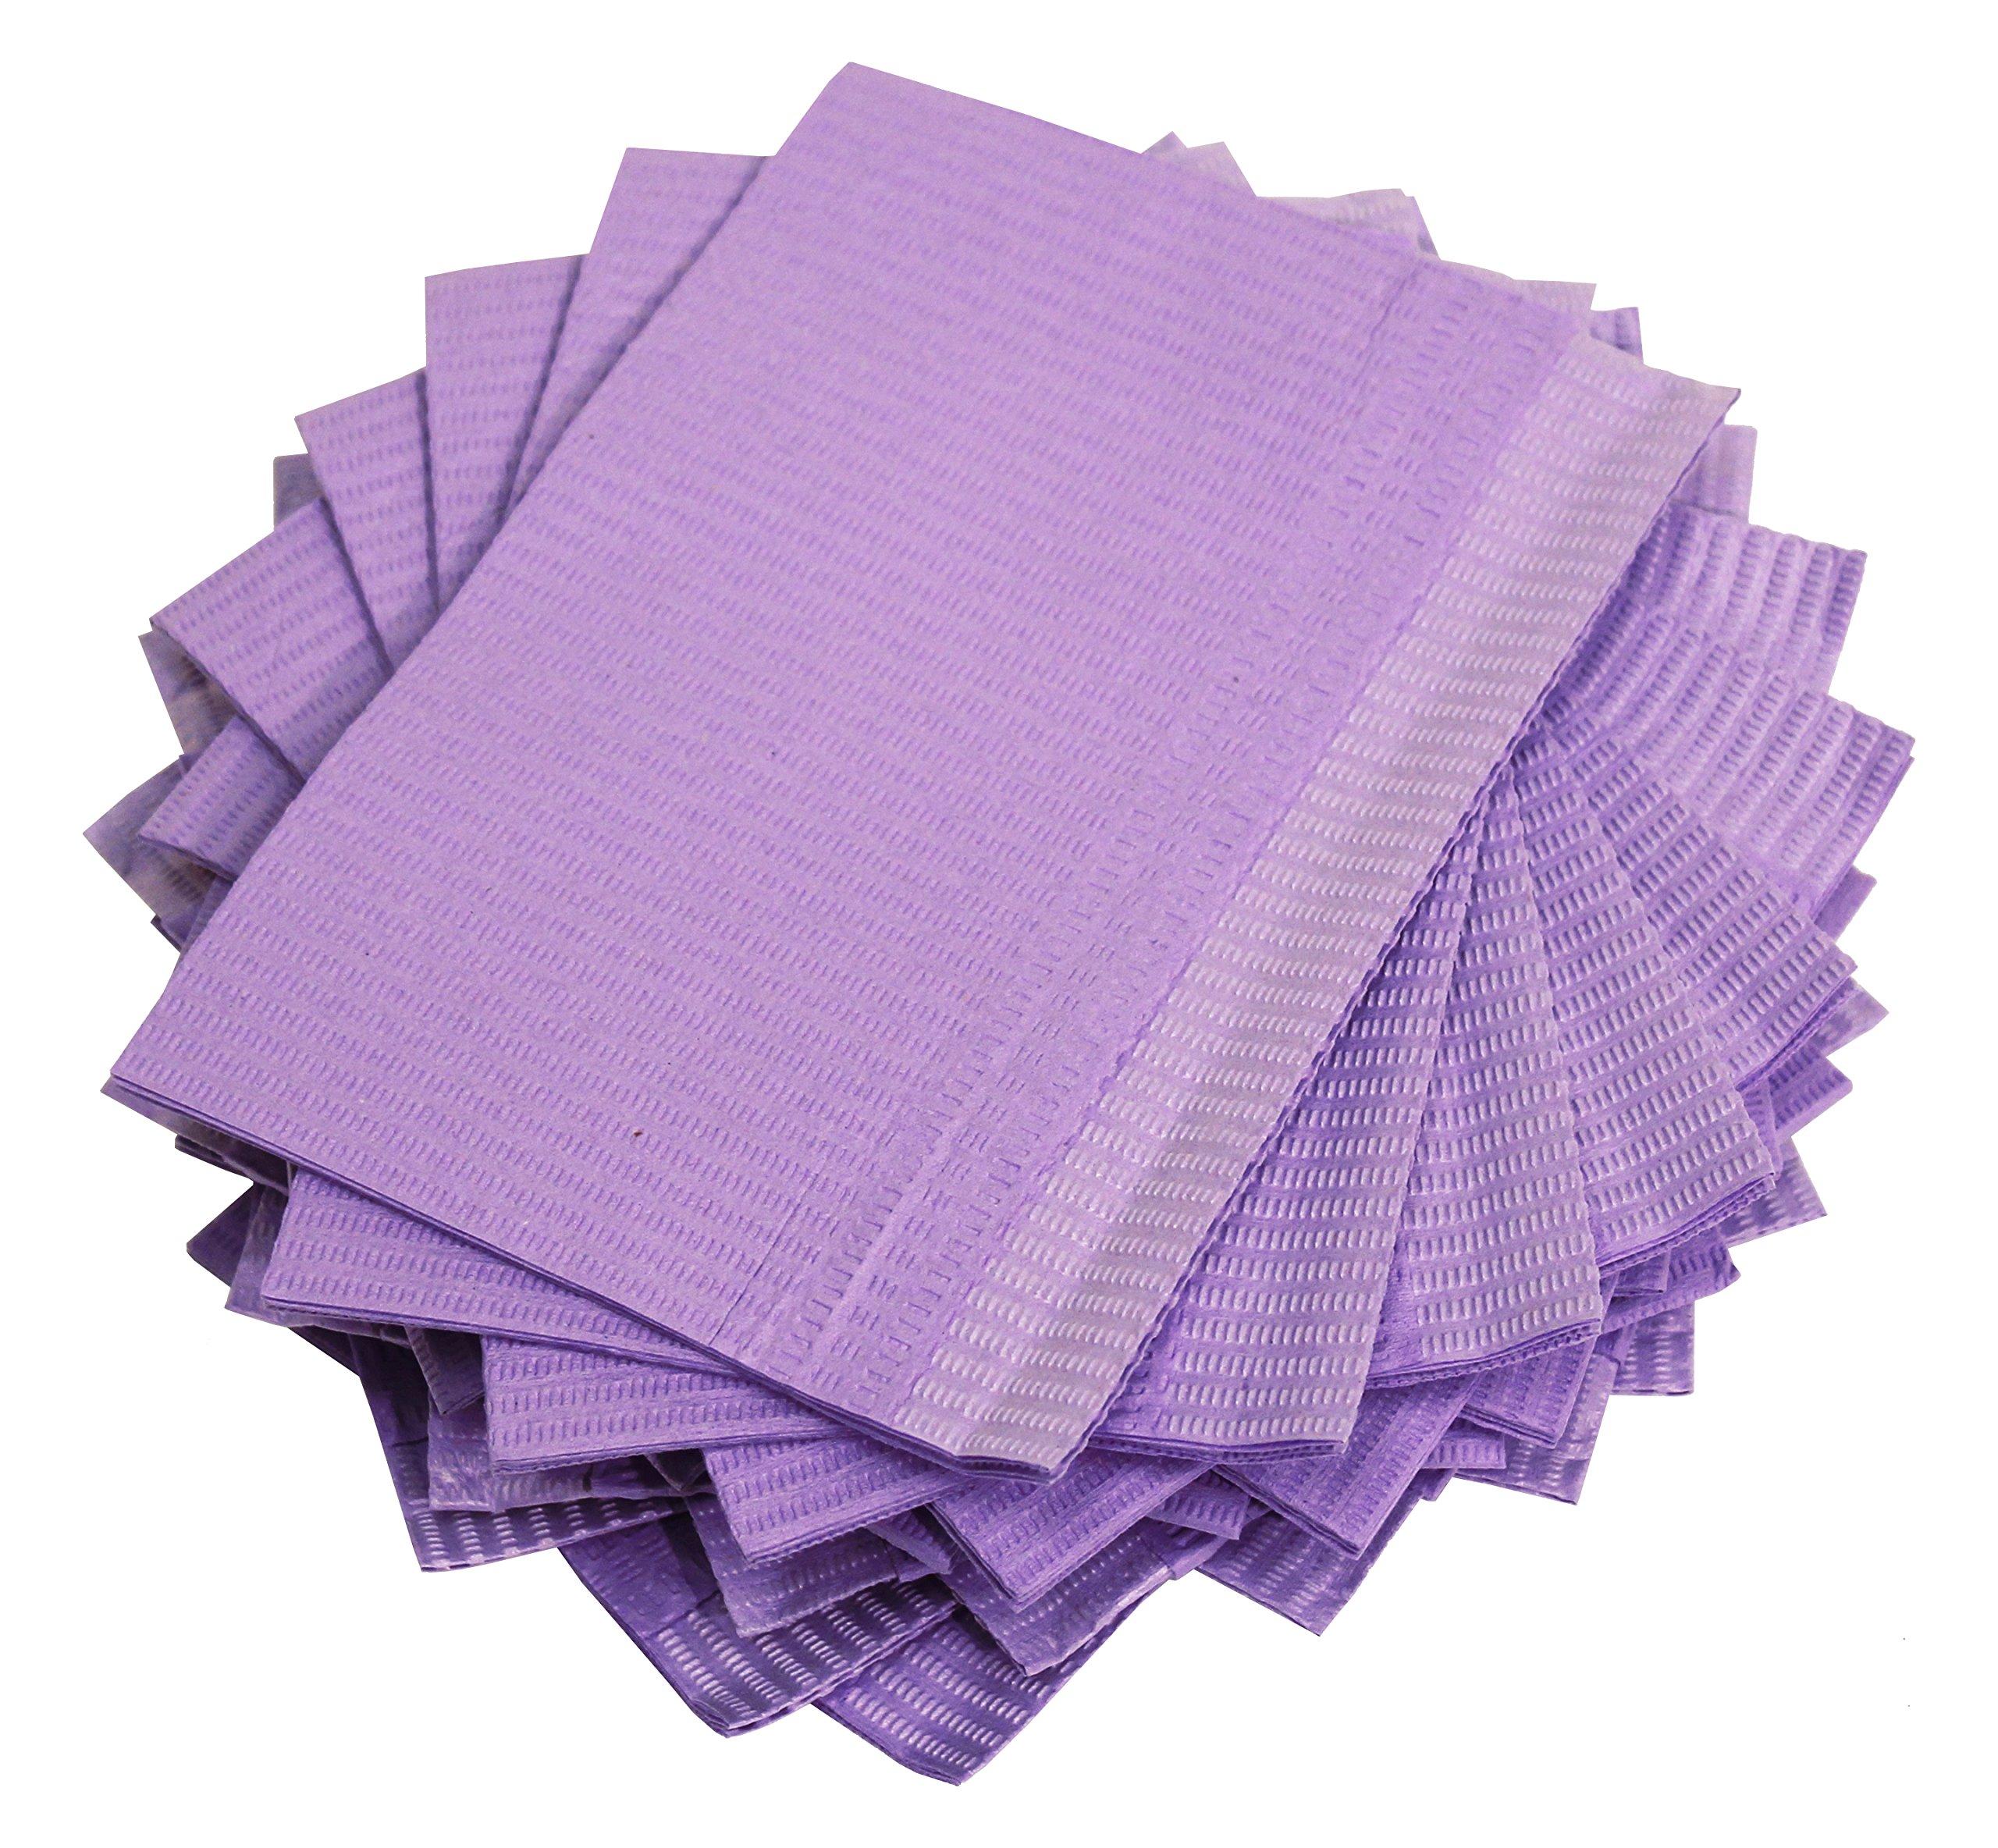 Adenna Dental Bibs/Lap Cloths, Violet (Box of 500)